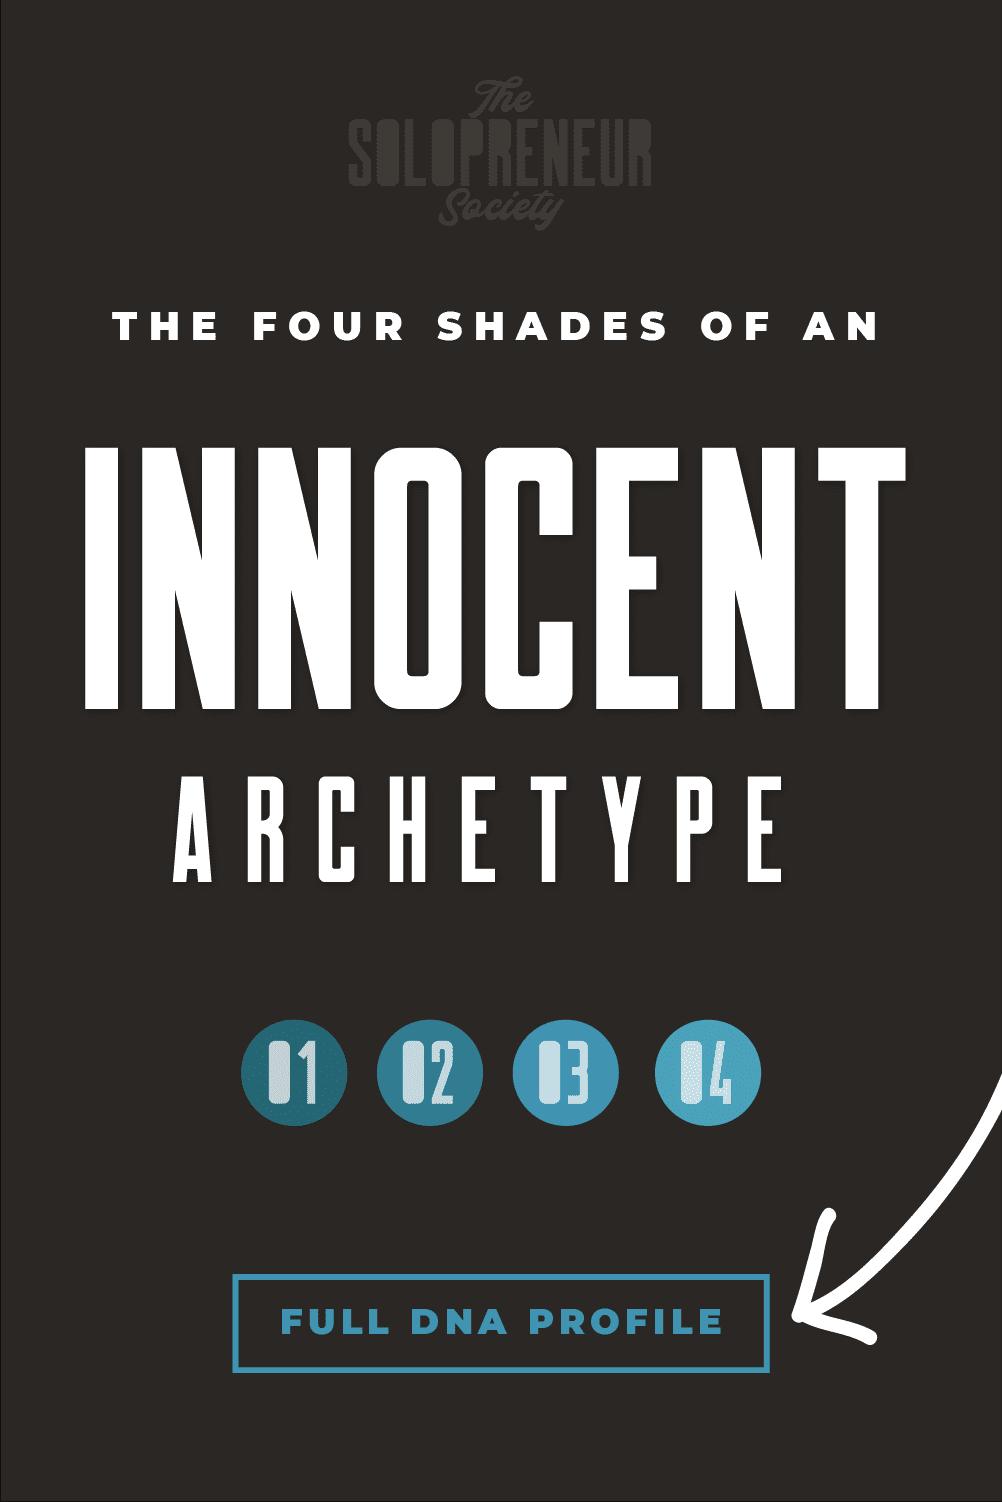 Innocent Archetype Brand Personality